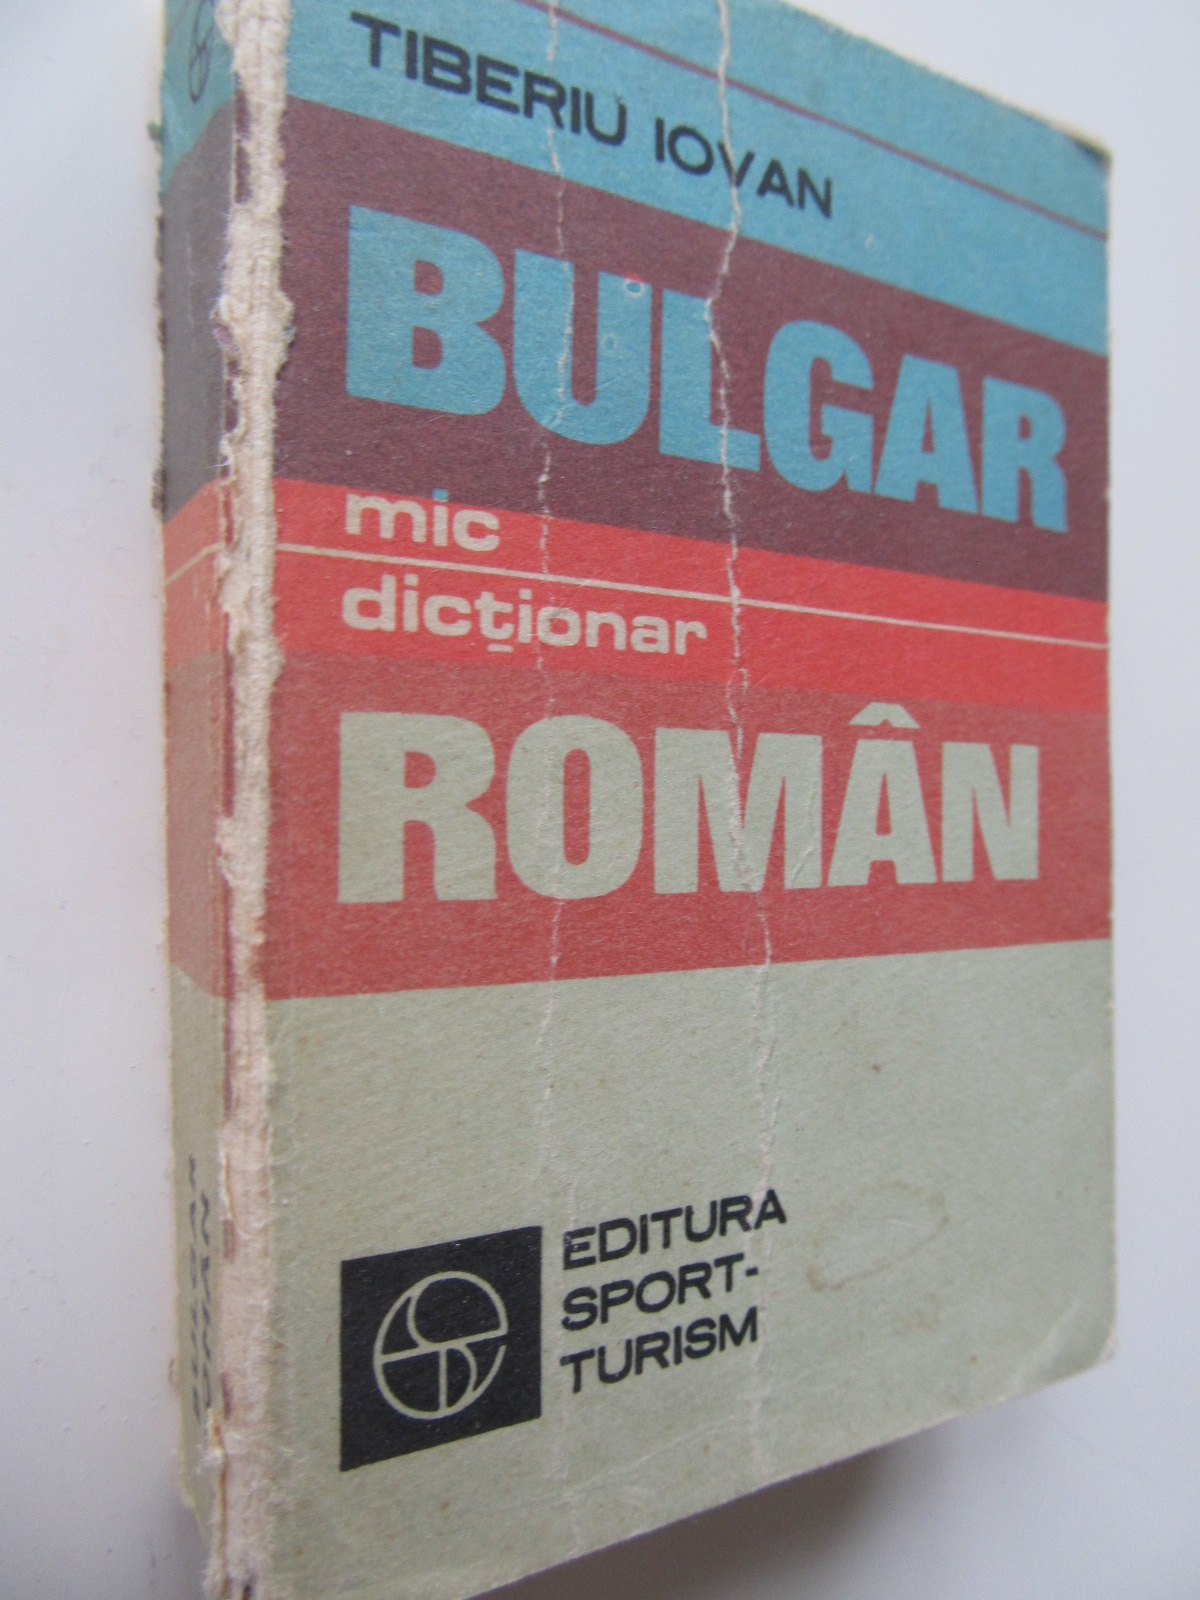 Mic dictionar Bulgar Roman - Tiberiu Iovan | Detalii carte